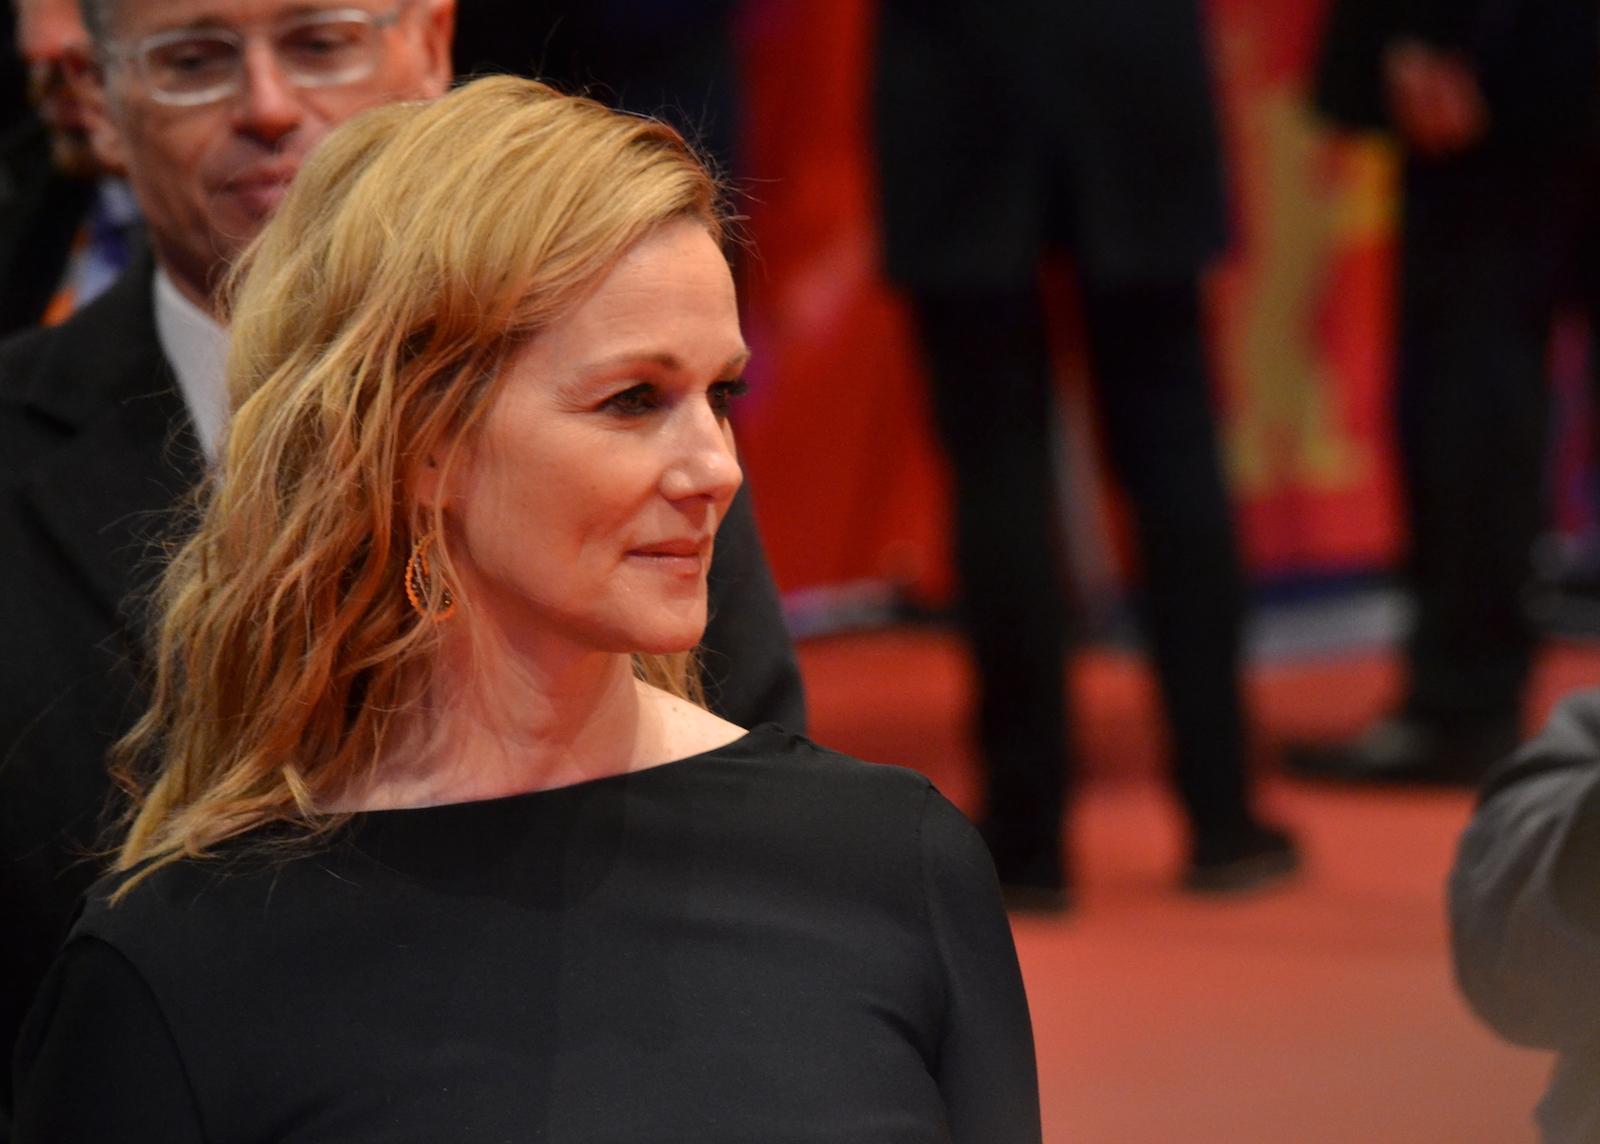 Berlino 2016: Laura Linney durante il red carpet di Genius